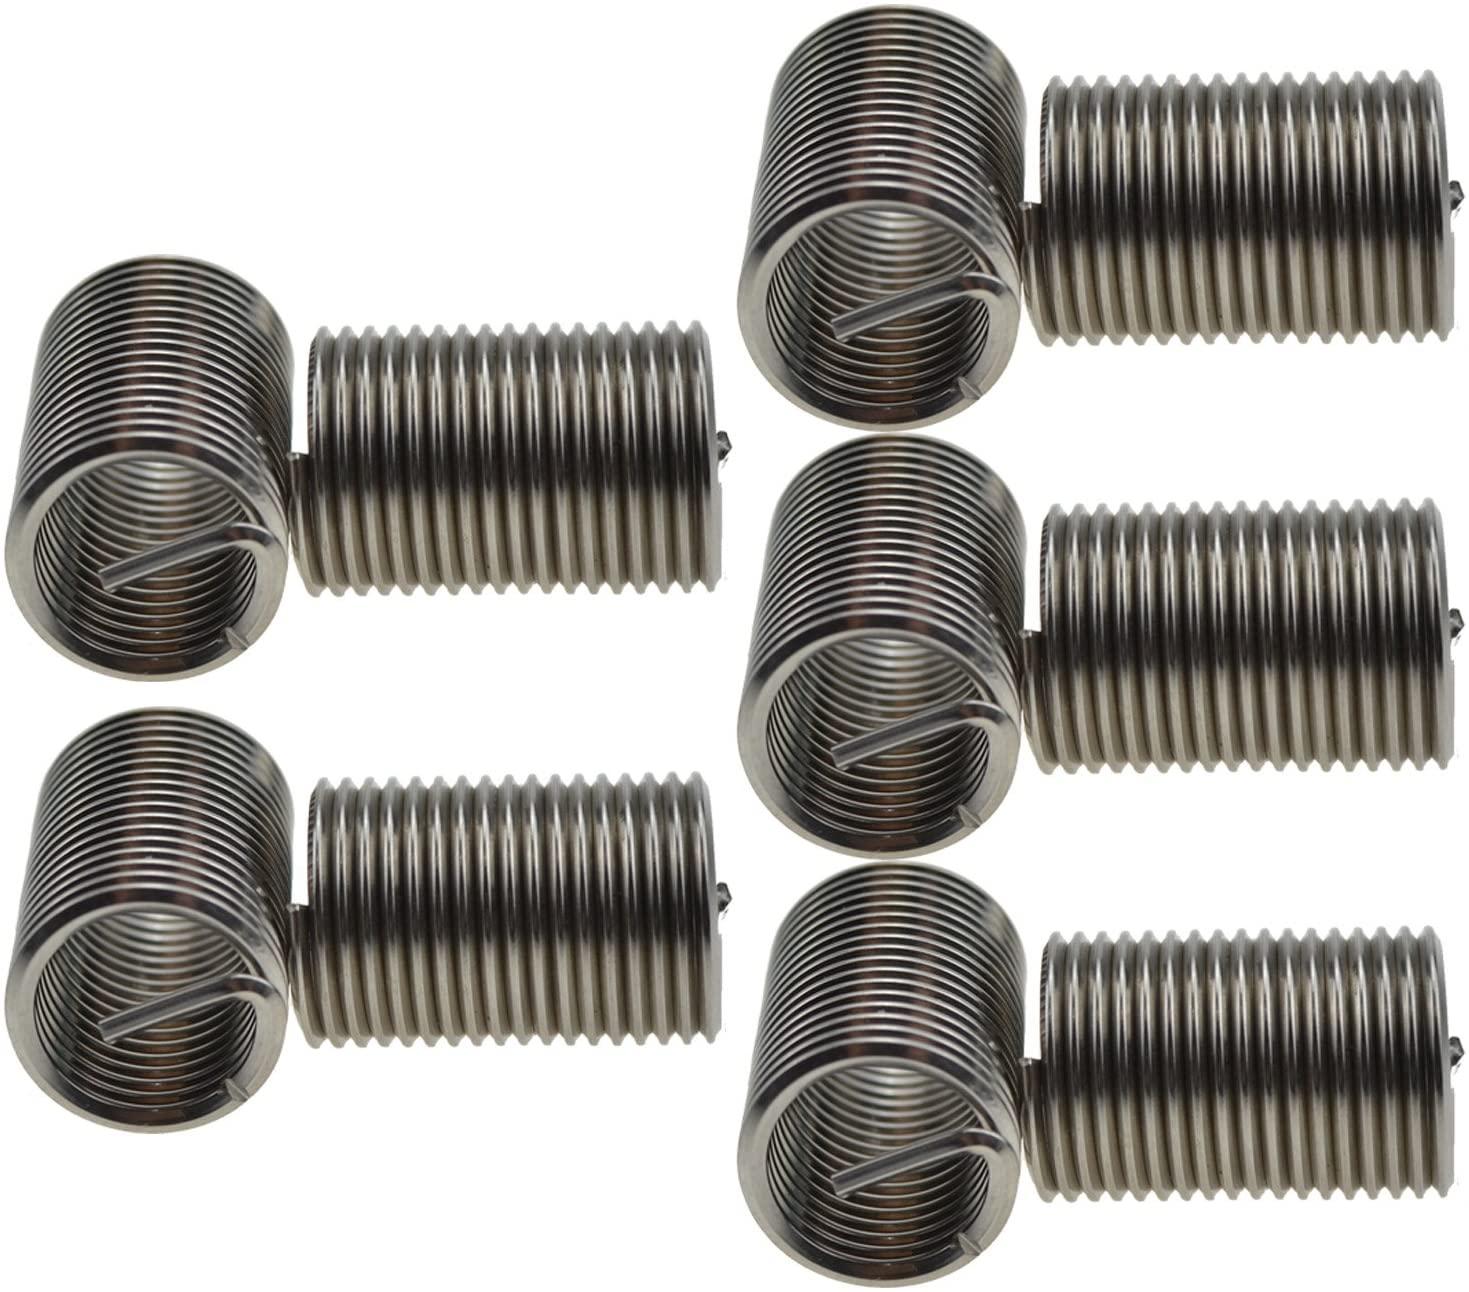 XunLiu 304 Stainless Steel Wire Thread Insert HeliCoil Stripped Thread Rethread Repair(10, M16-2.0X2.5D)